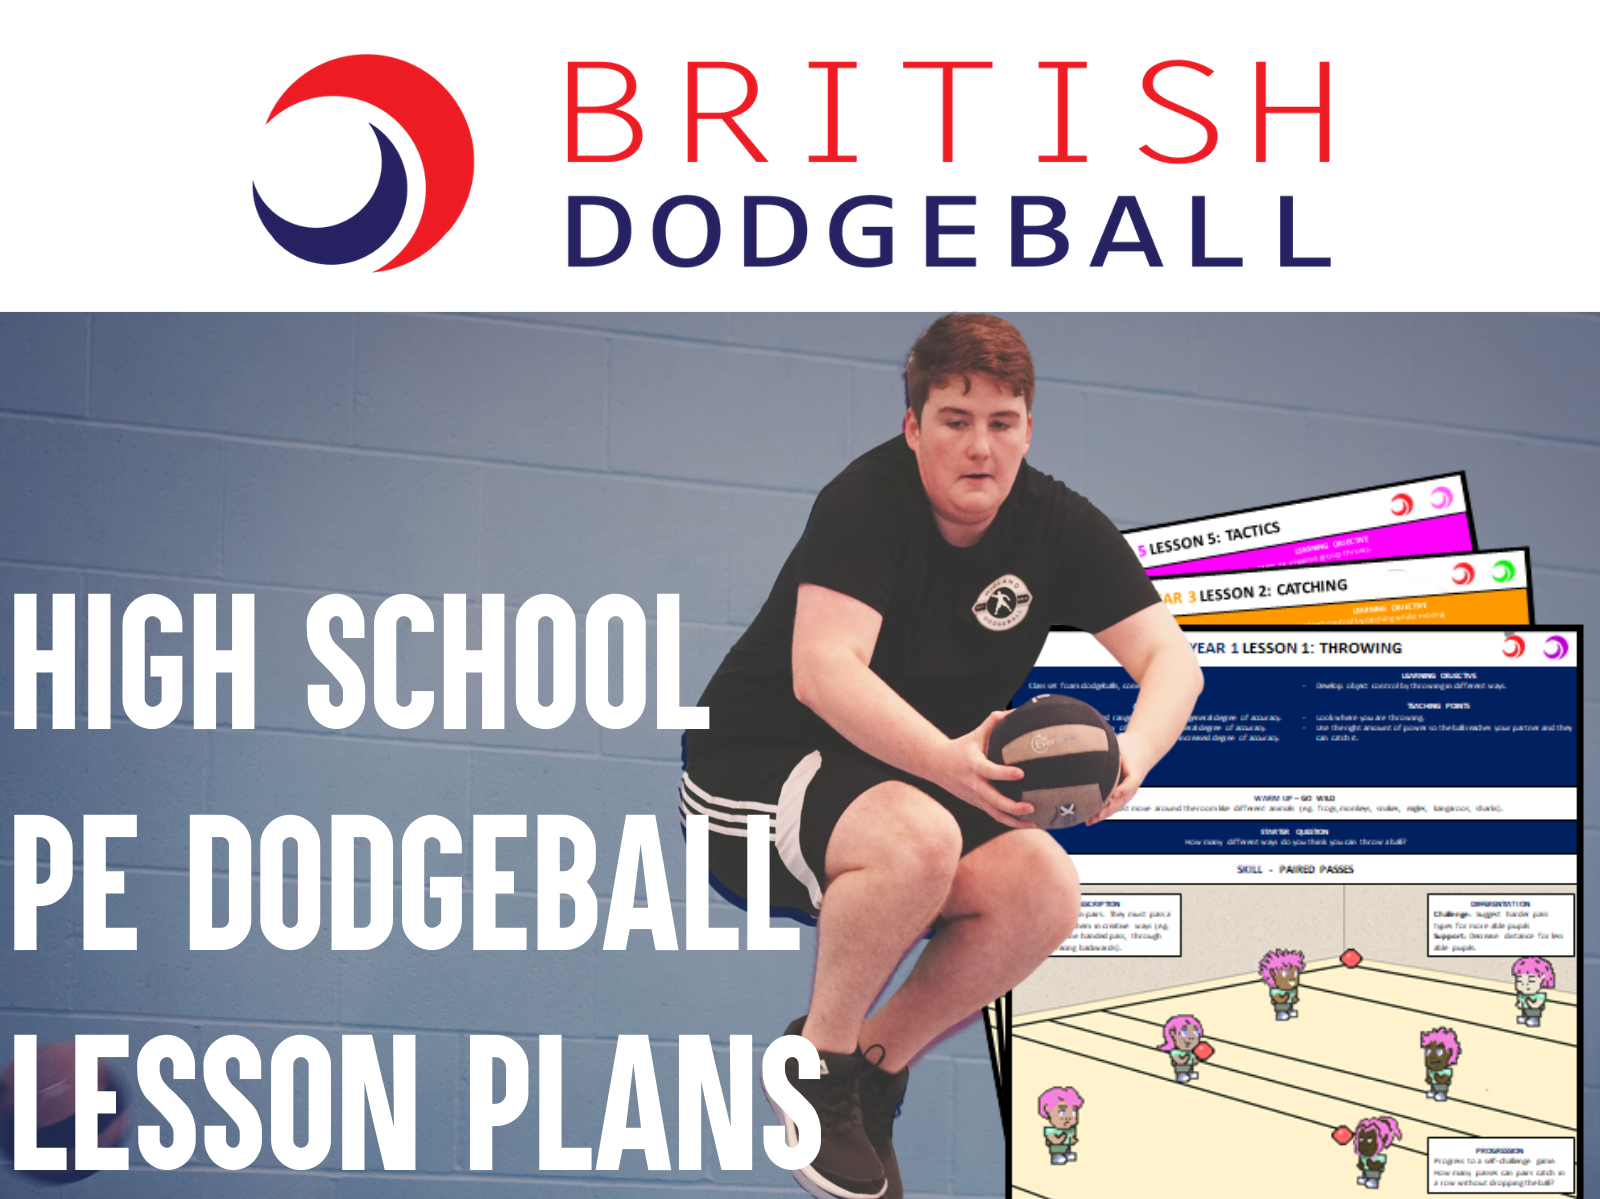 Dodgeball PE Scheme of Work - Secondary School Set